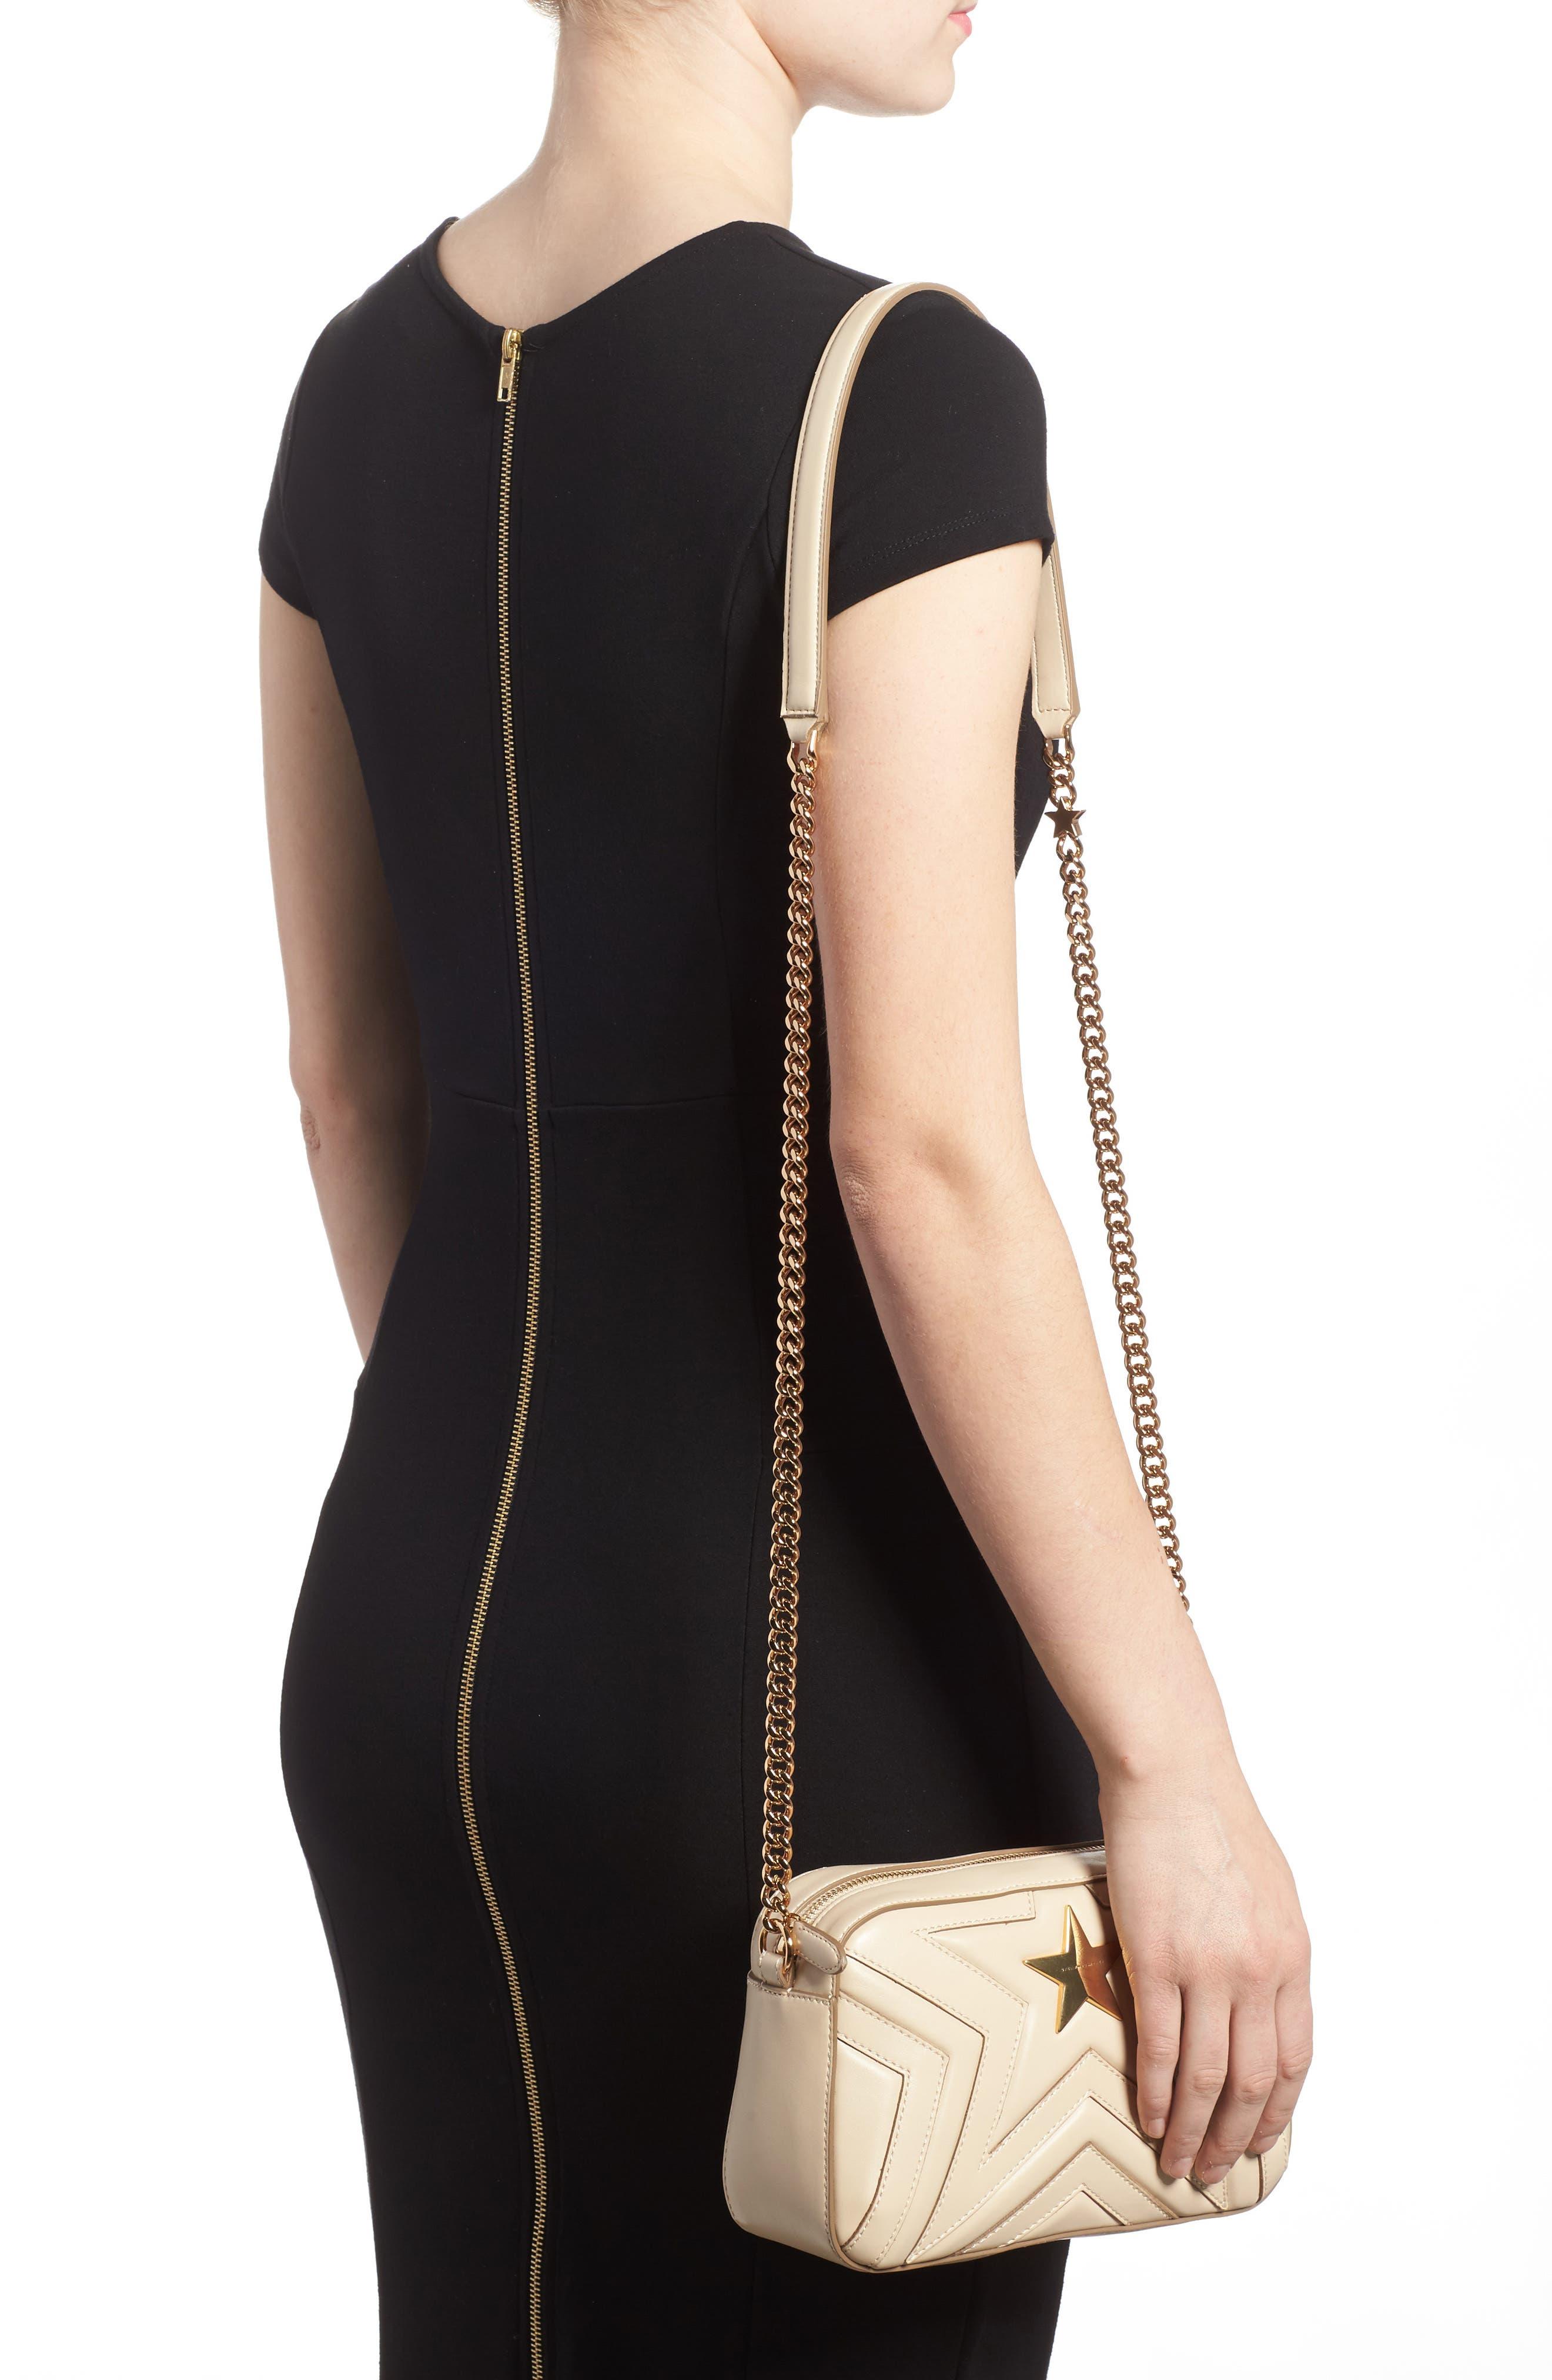 Alter Nappa Faux Leather Shoulder Bag,                             Alternate thumbnail 2, color,                             Cream